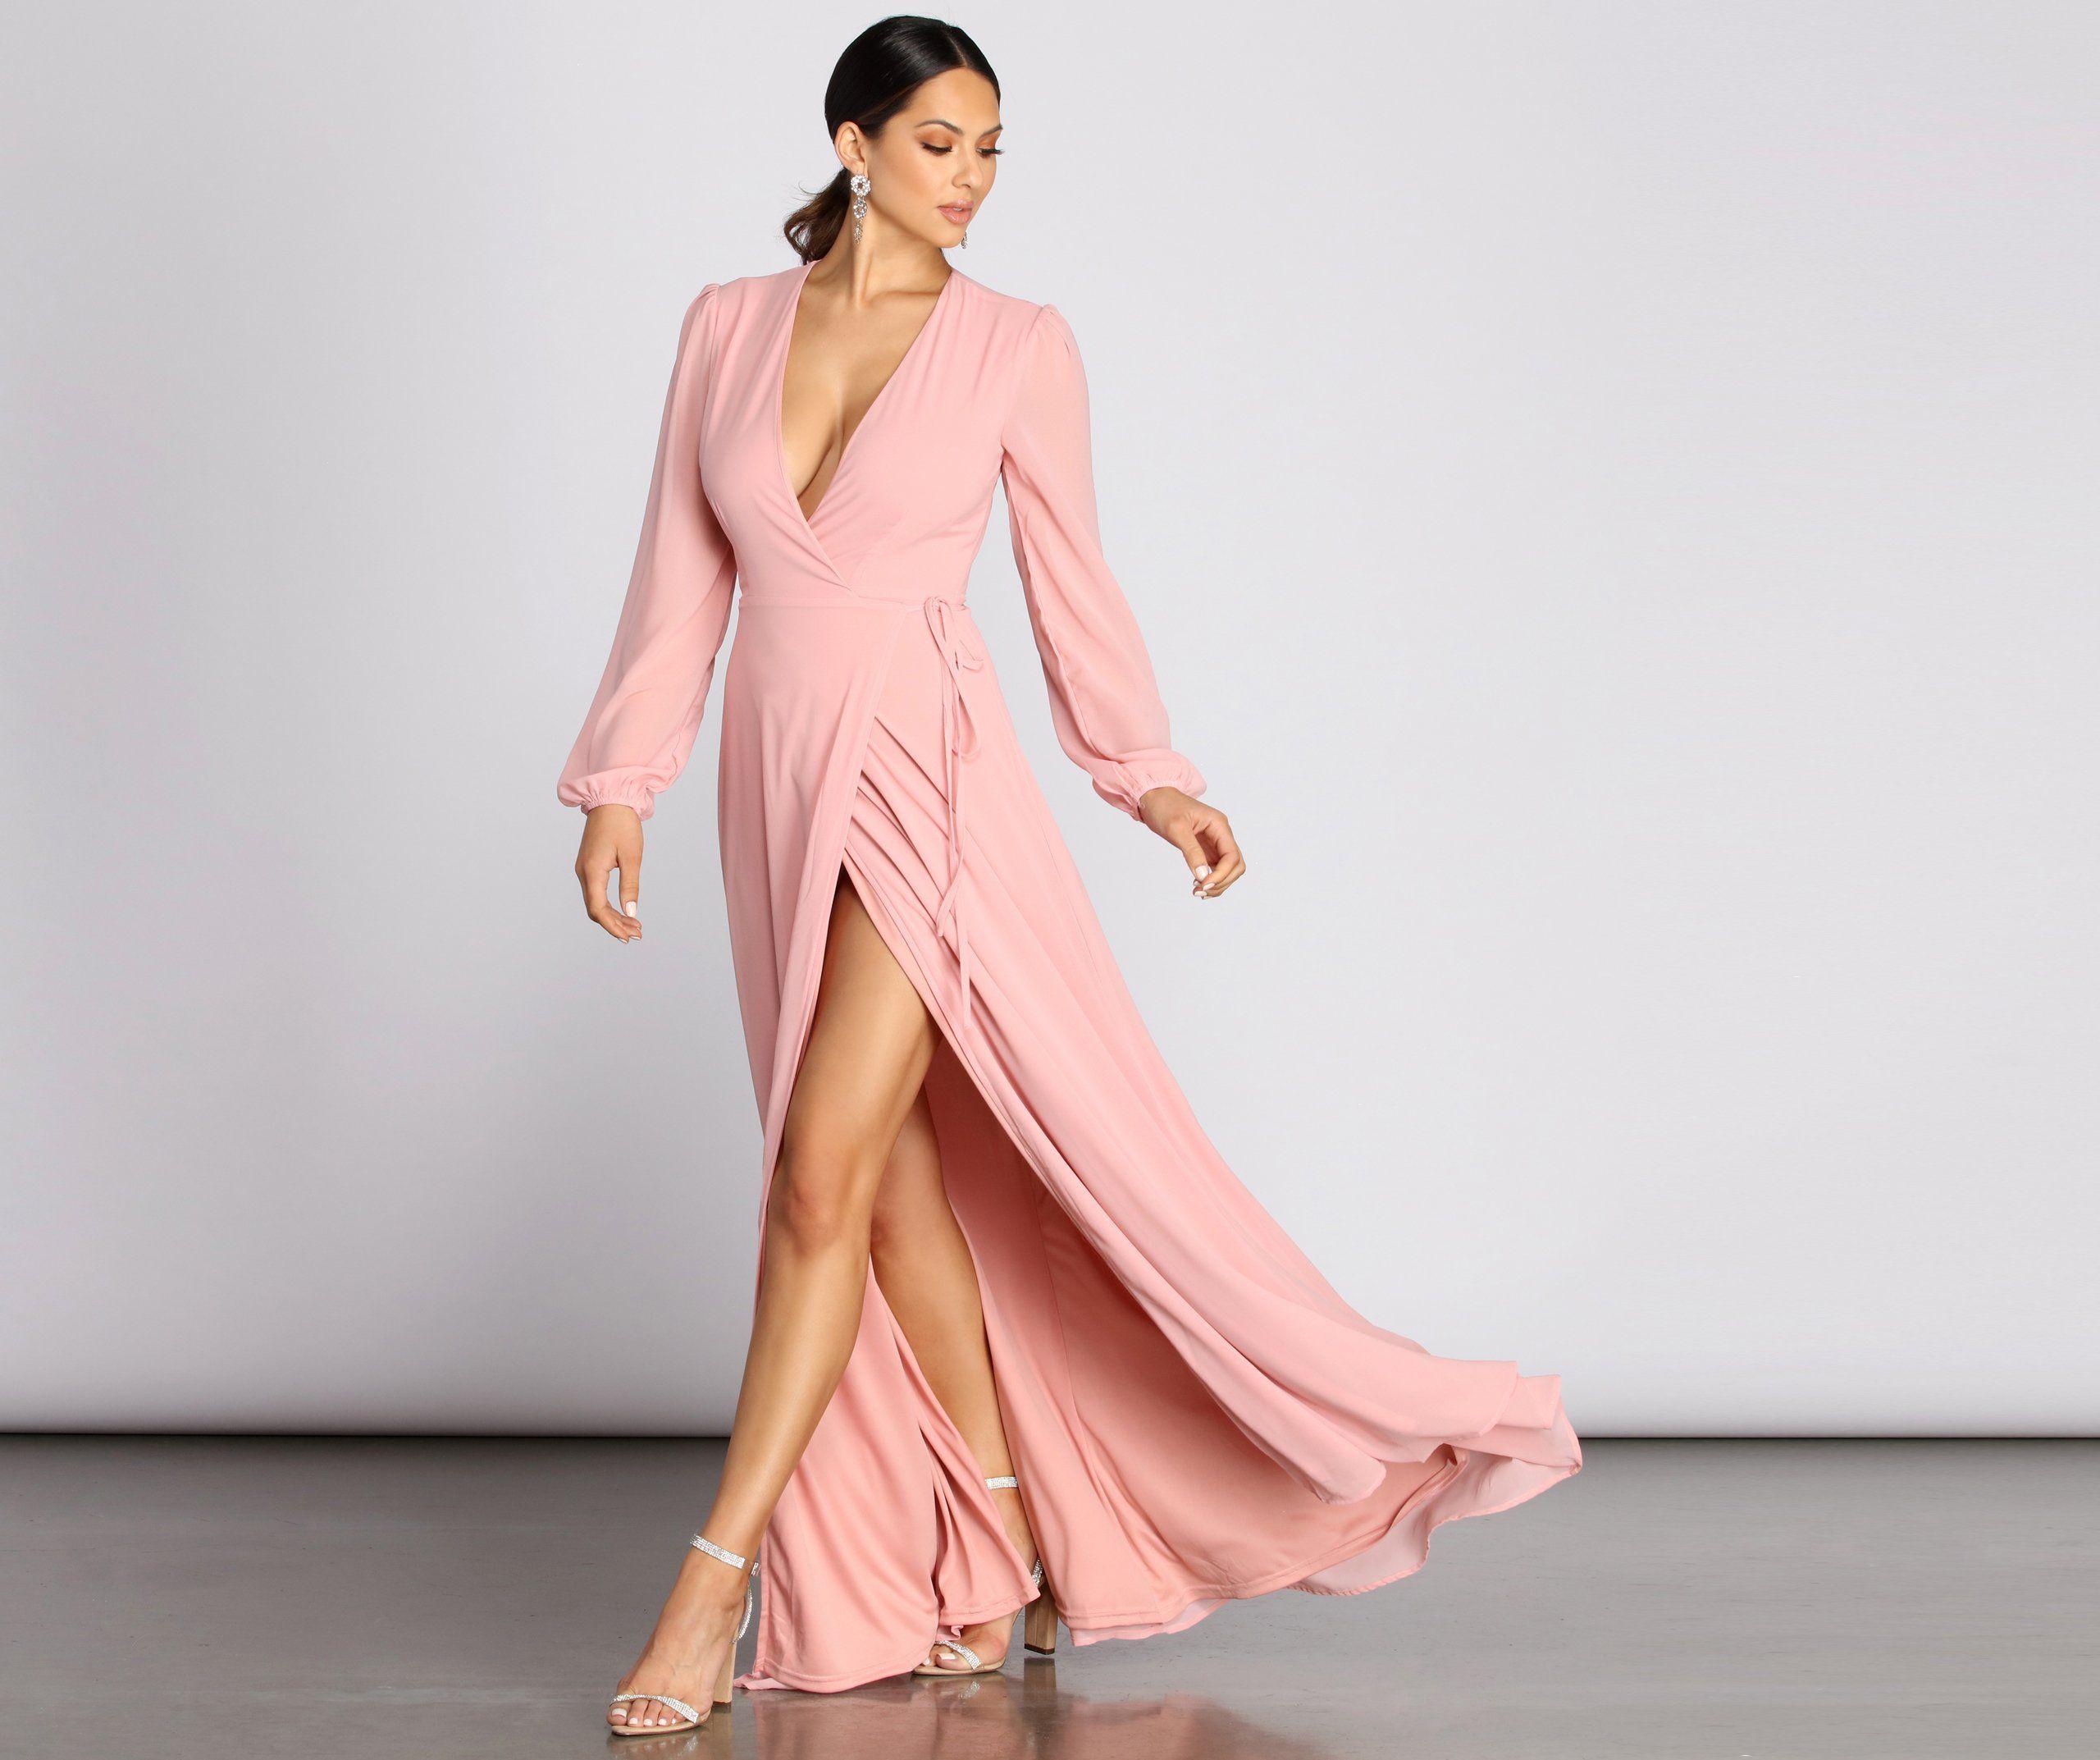 Jordan Chiffon Wrap Dress In 2020 Pink Long Sleeve Dress Long Sleeve Wrap Dress Pink Wrap Dress [ 2145 x 2560 Pixel ]